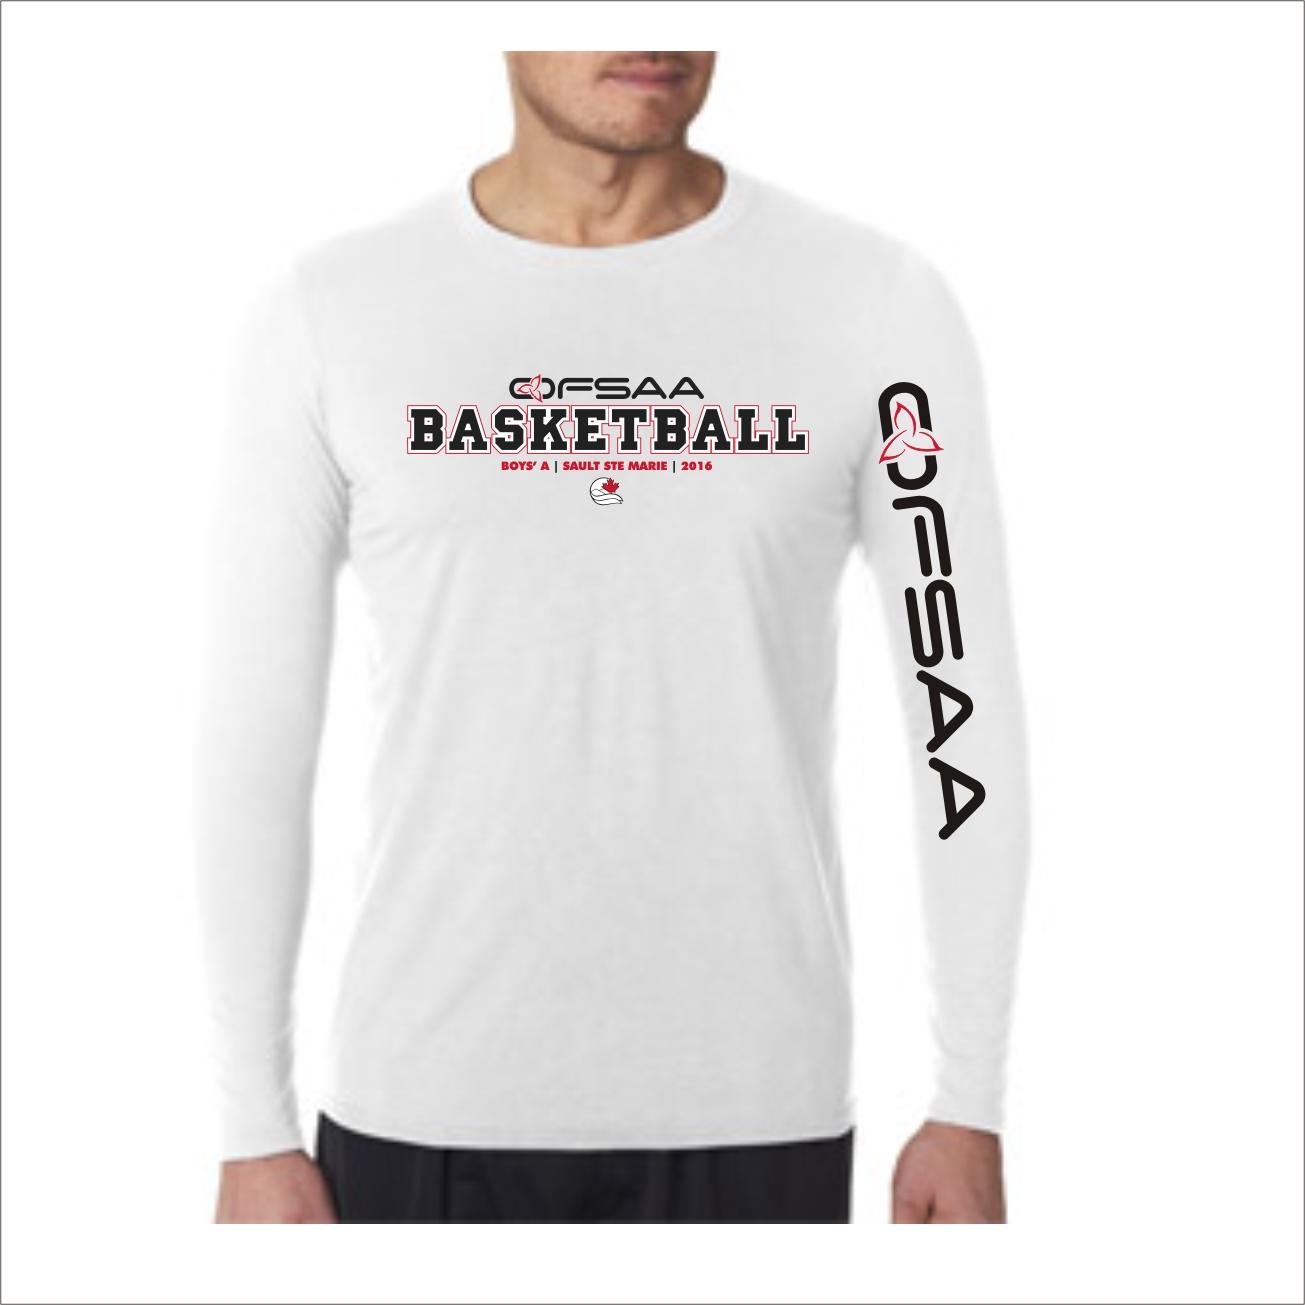 2016 Boys A Basketball LS Tshirt single.jpg